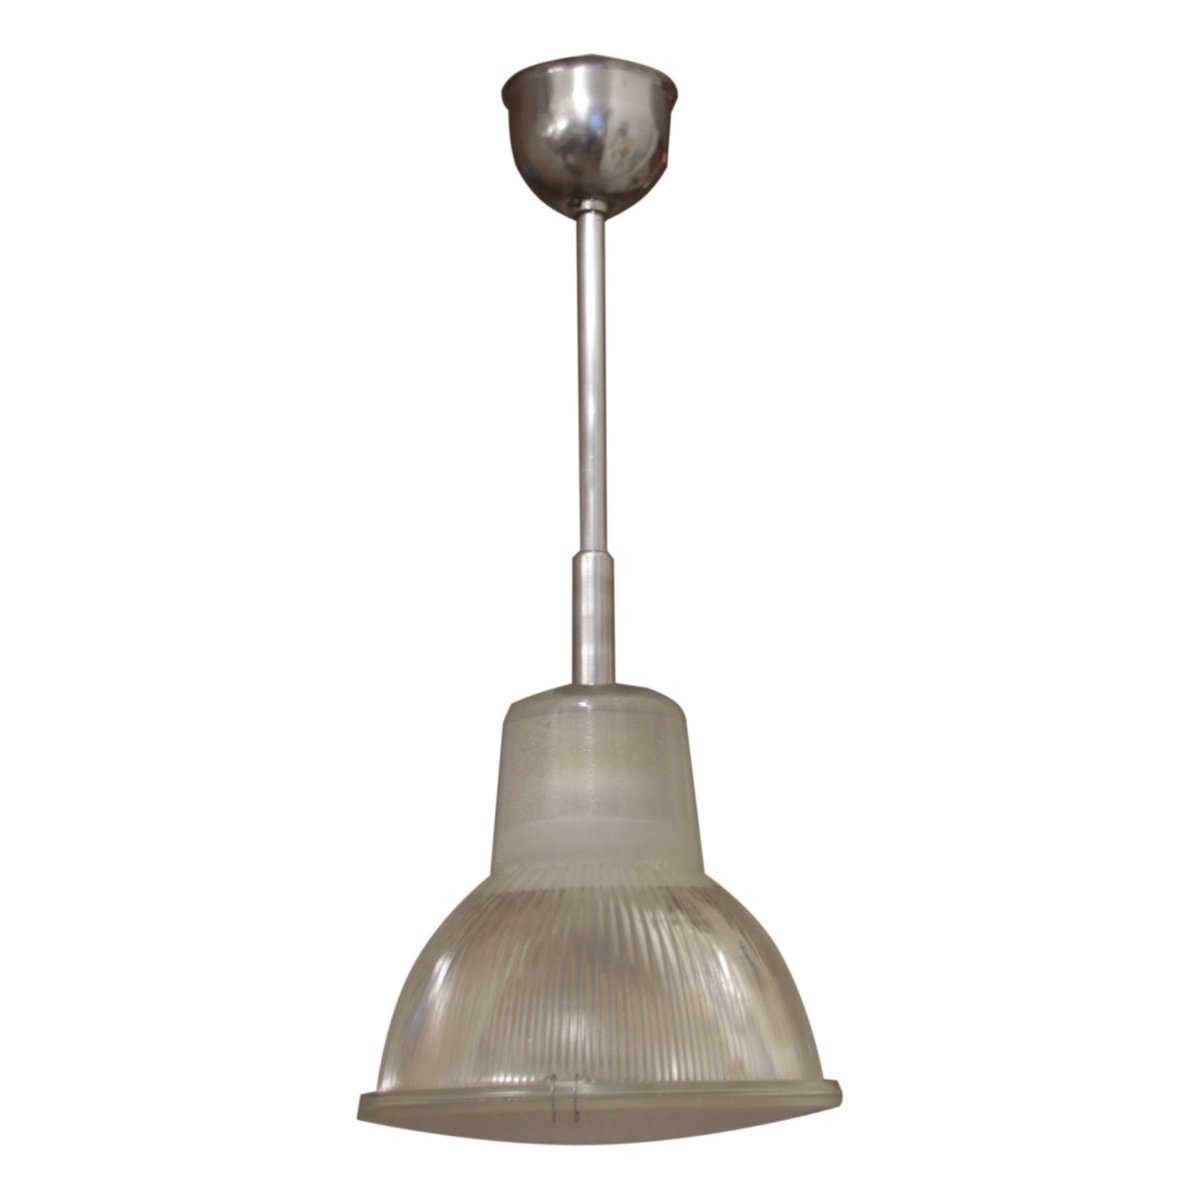 lampe suspension vintage industrielle de holophane france en vente sur pamono. Black Bedroom Furniture Sets. Home Design Ideas